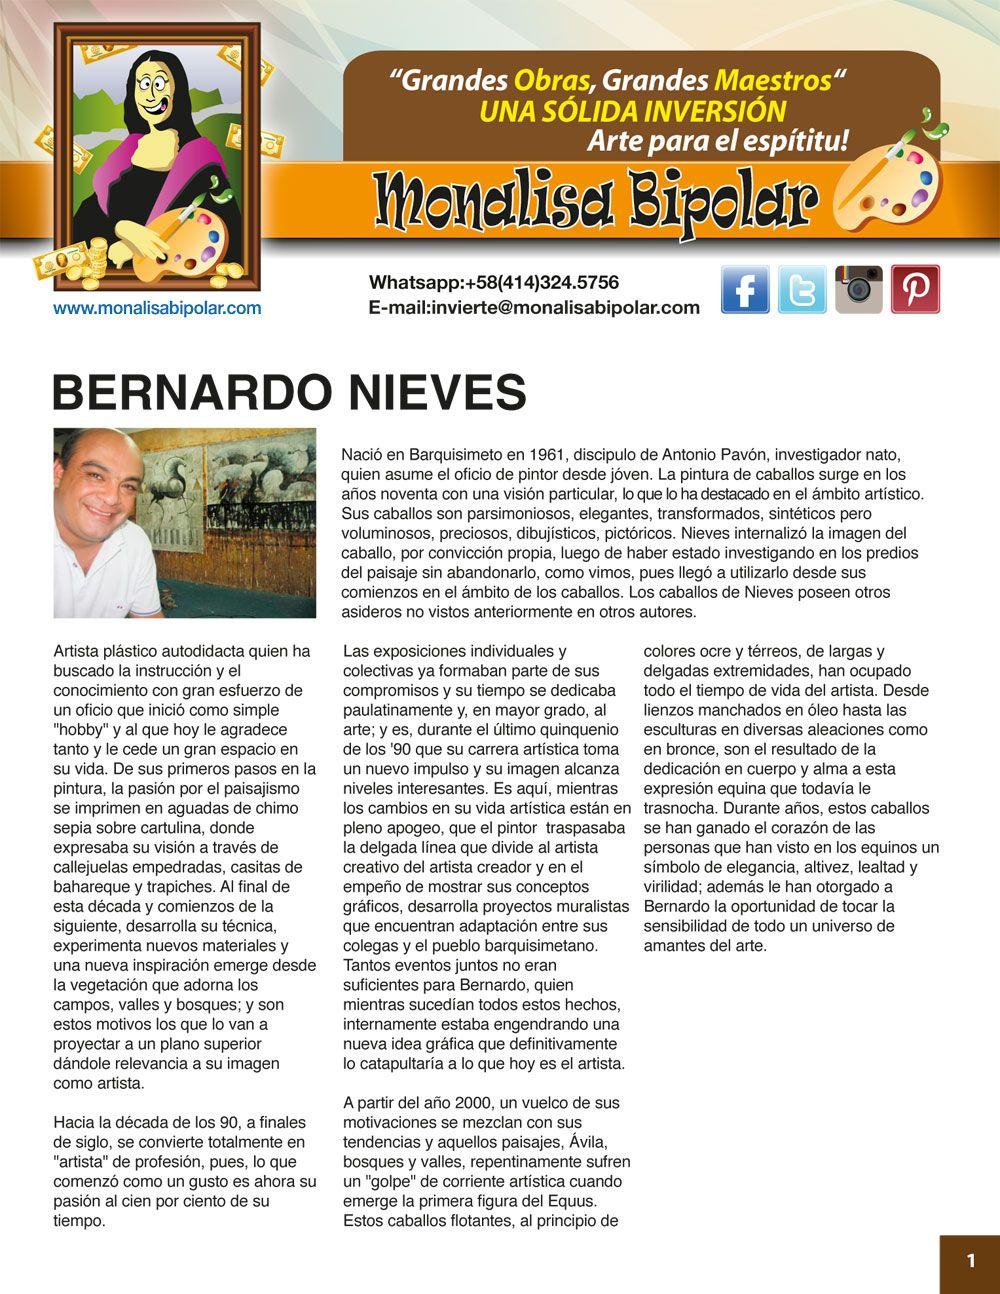 BERNARDO NIEVES - Curriculum   MAESTROS / ARTISTAS para Monalisa ...